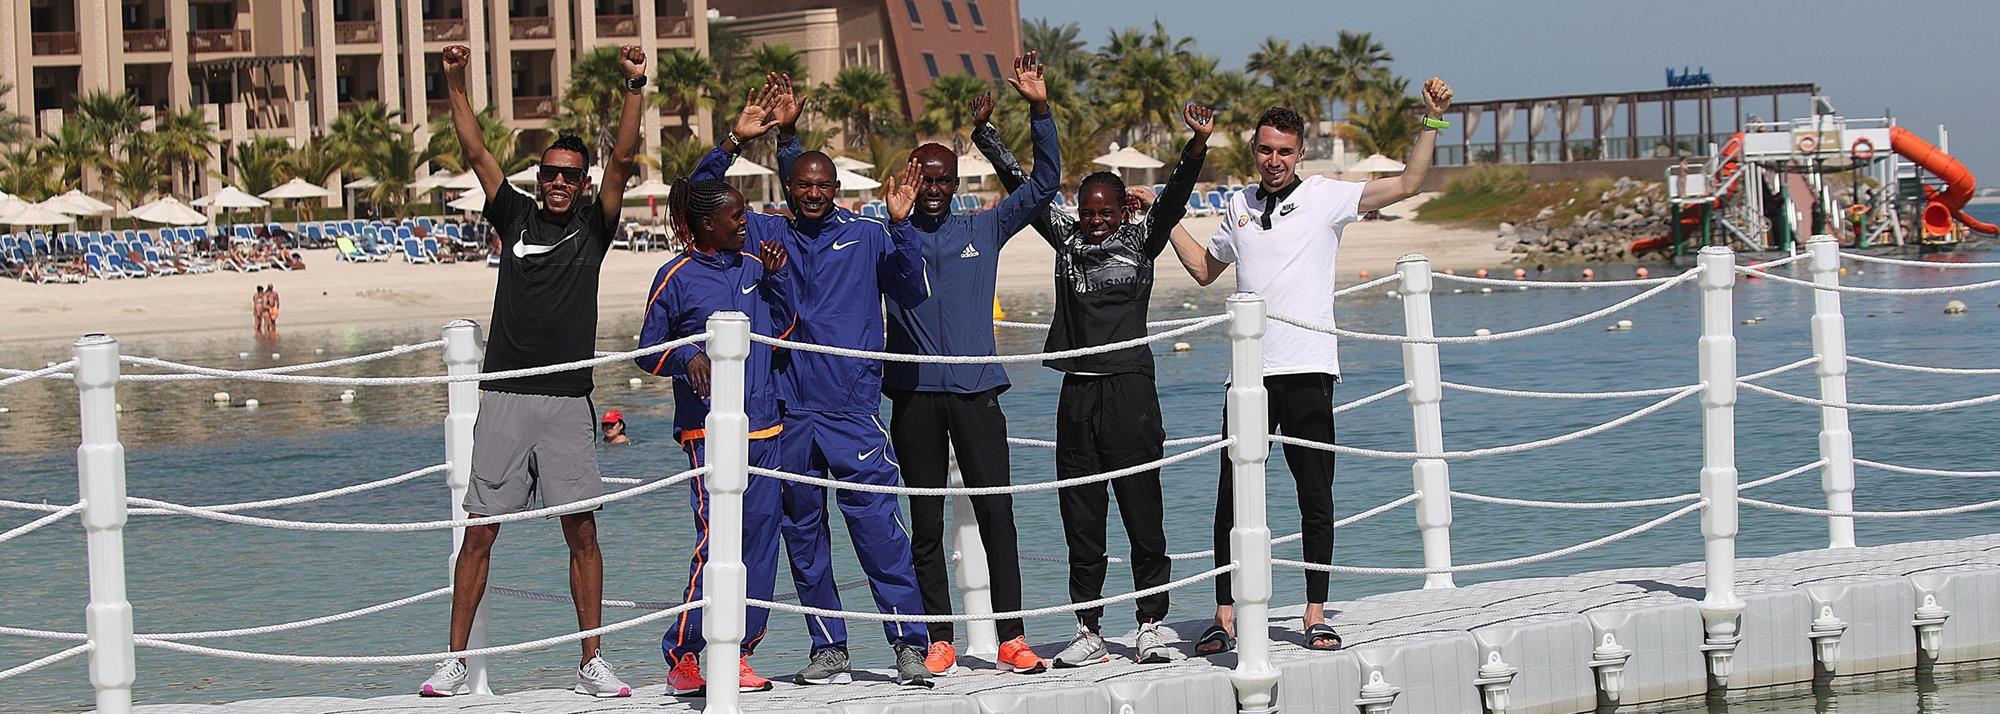 Kosgei targeting fast time at Ras Al Khaimah Half Marathon